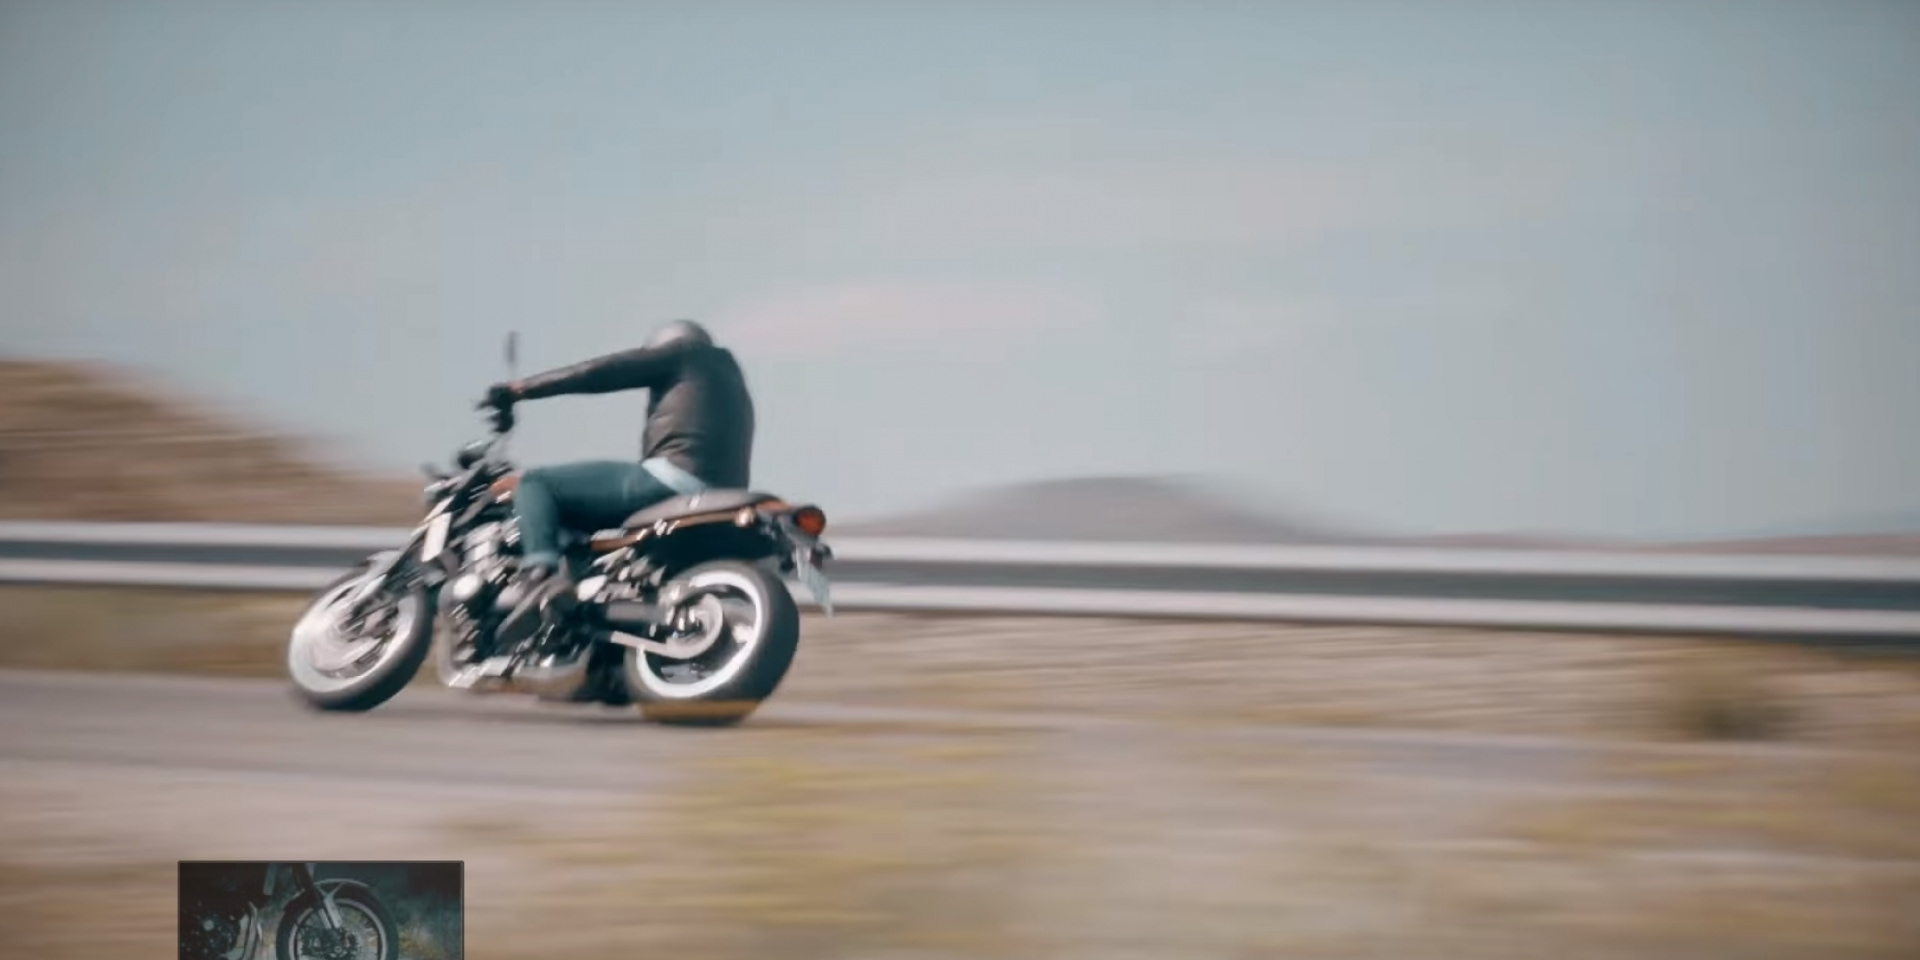 Neo-Retro大戰! Kawasaki Z900RS參戰 復古街車戰國時代來臨?